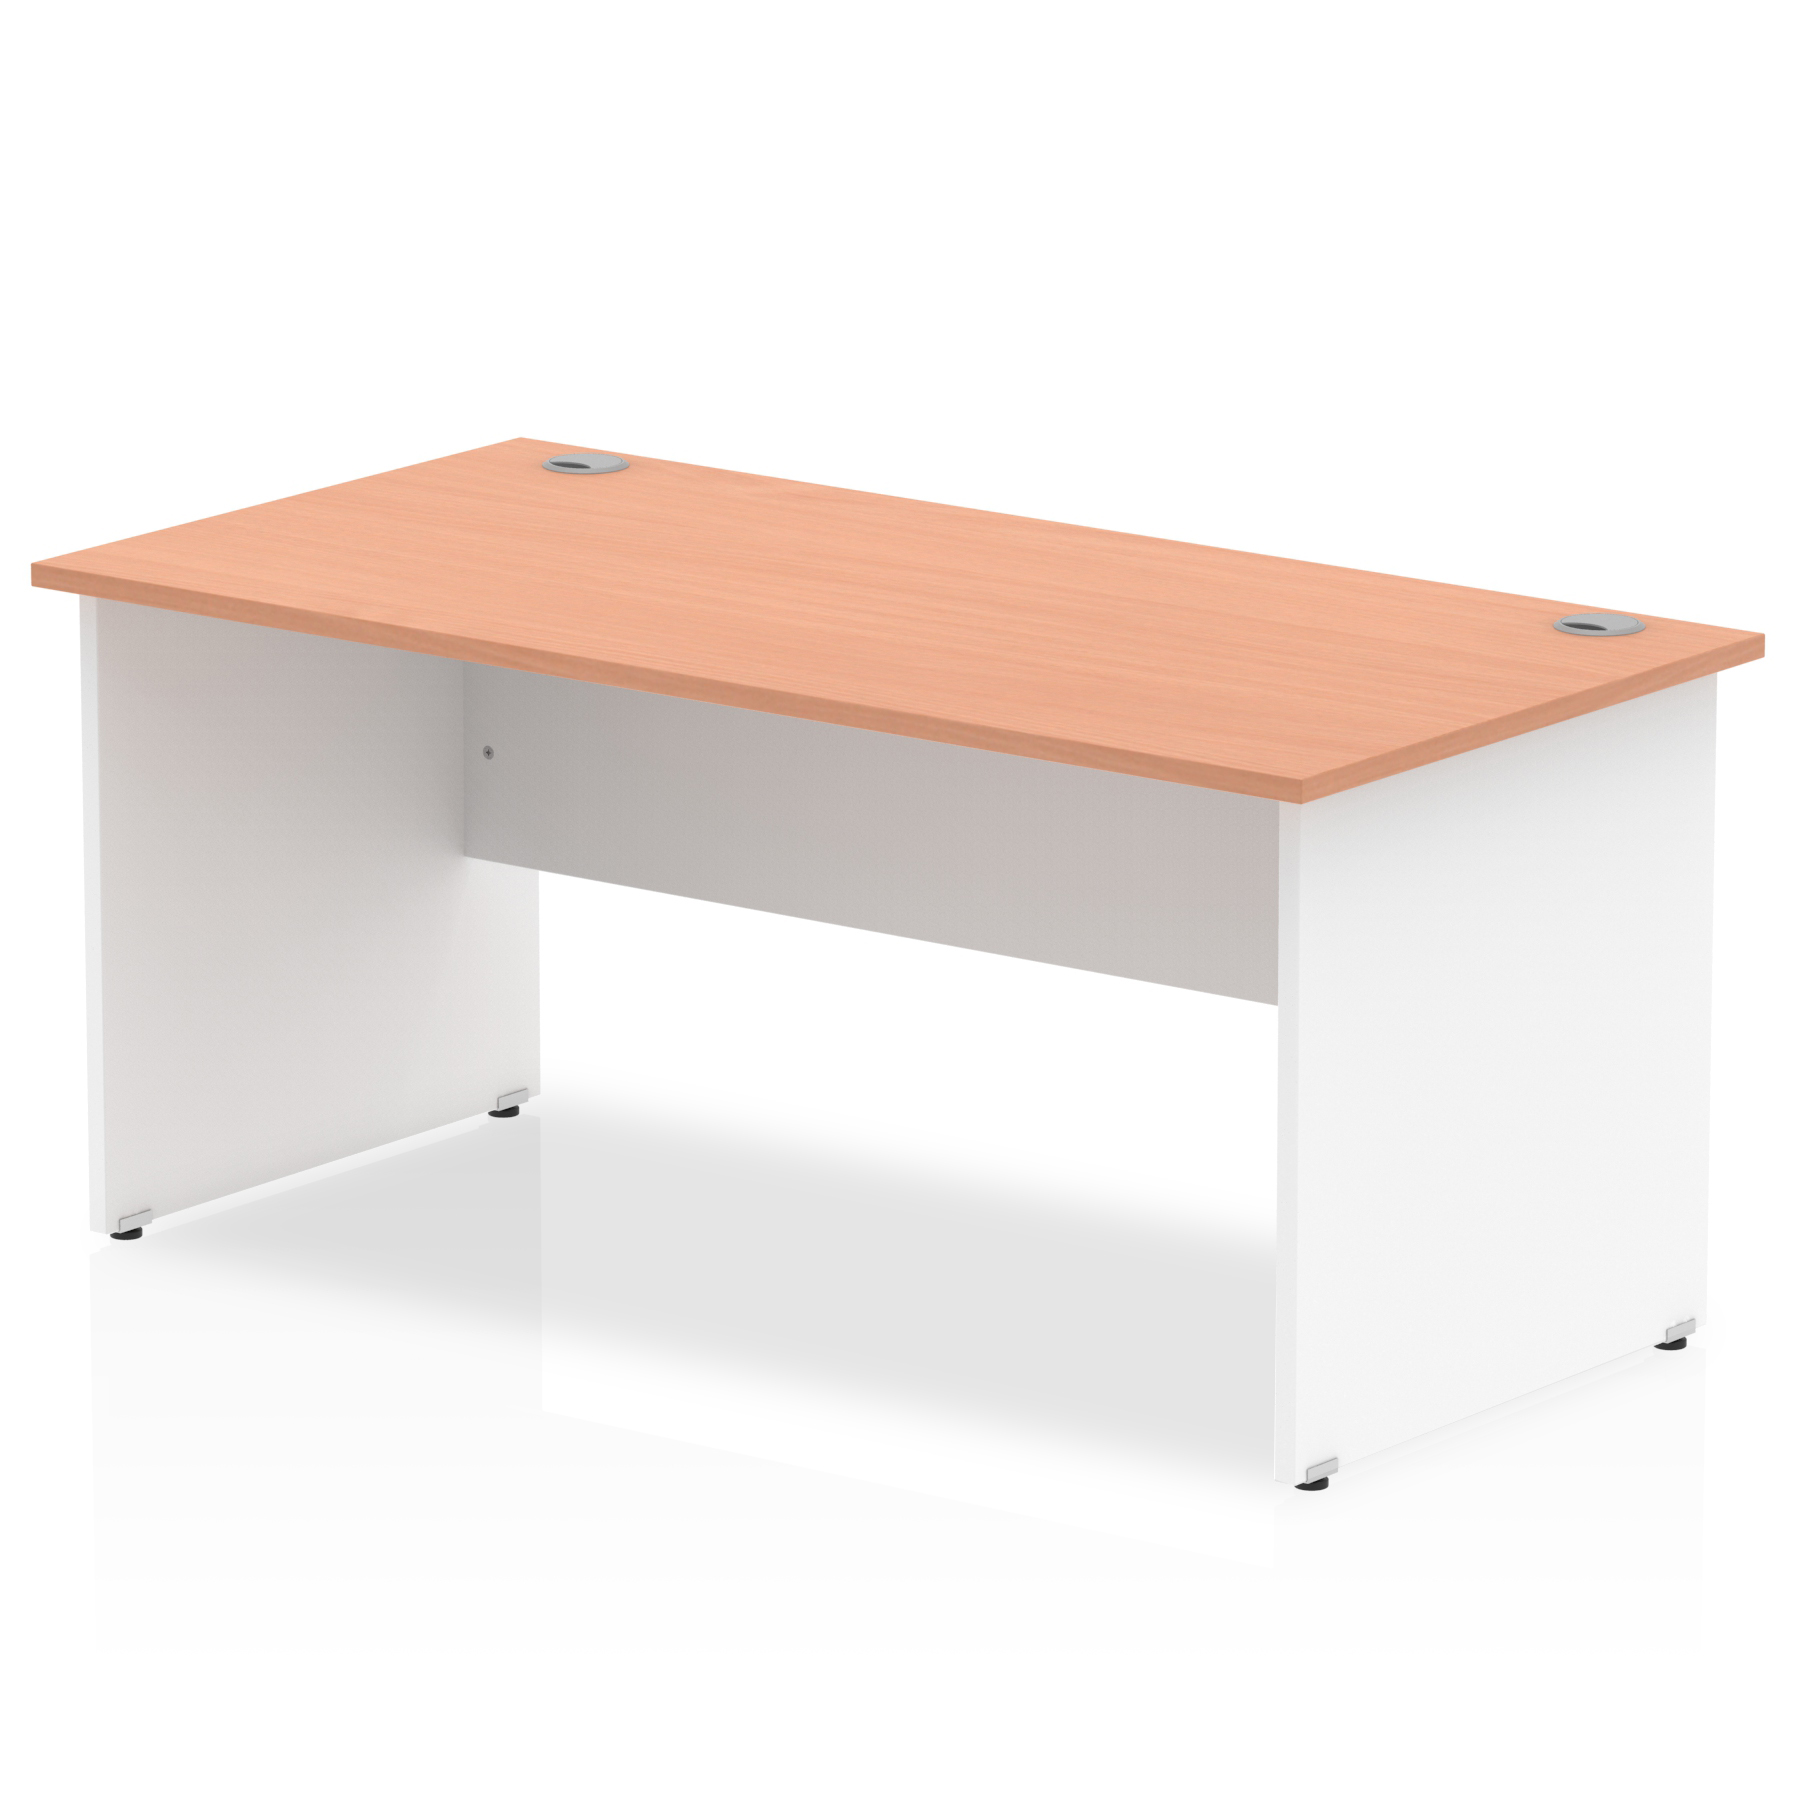 Impulse Cantilever 1800mm Rectangle Desk Beech